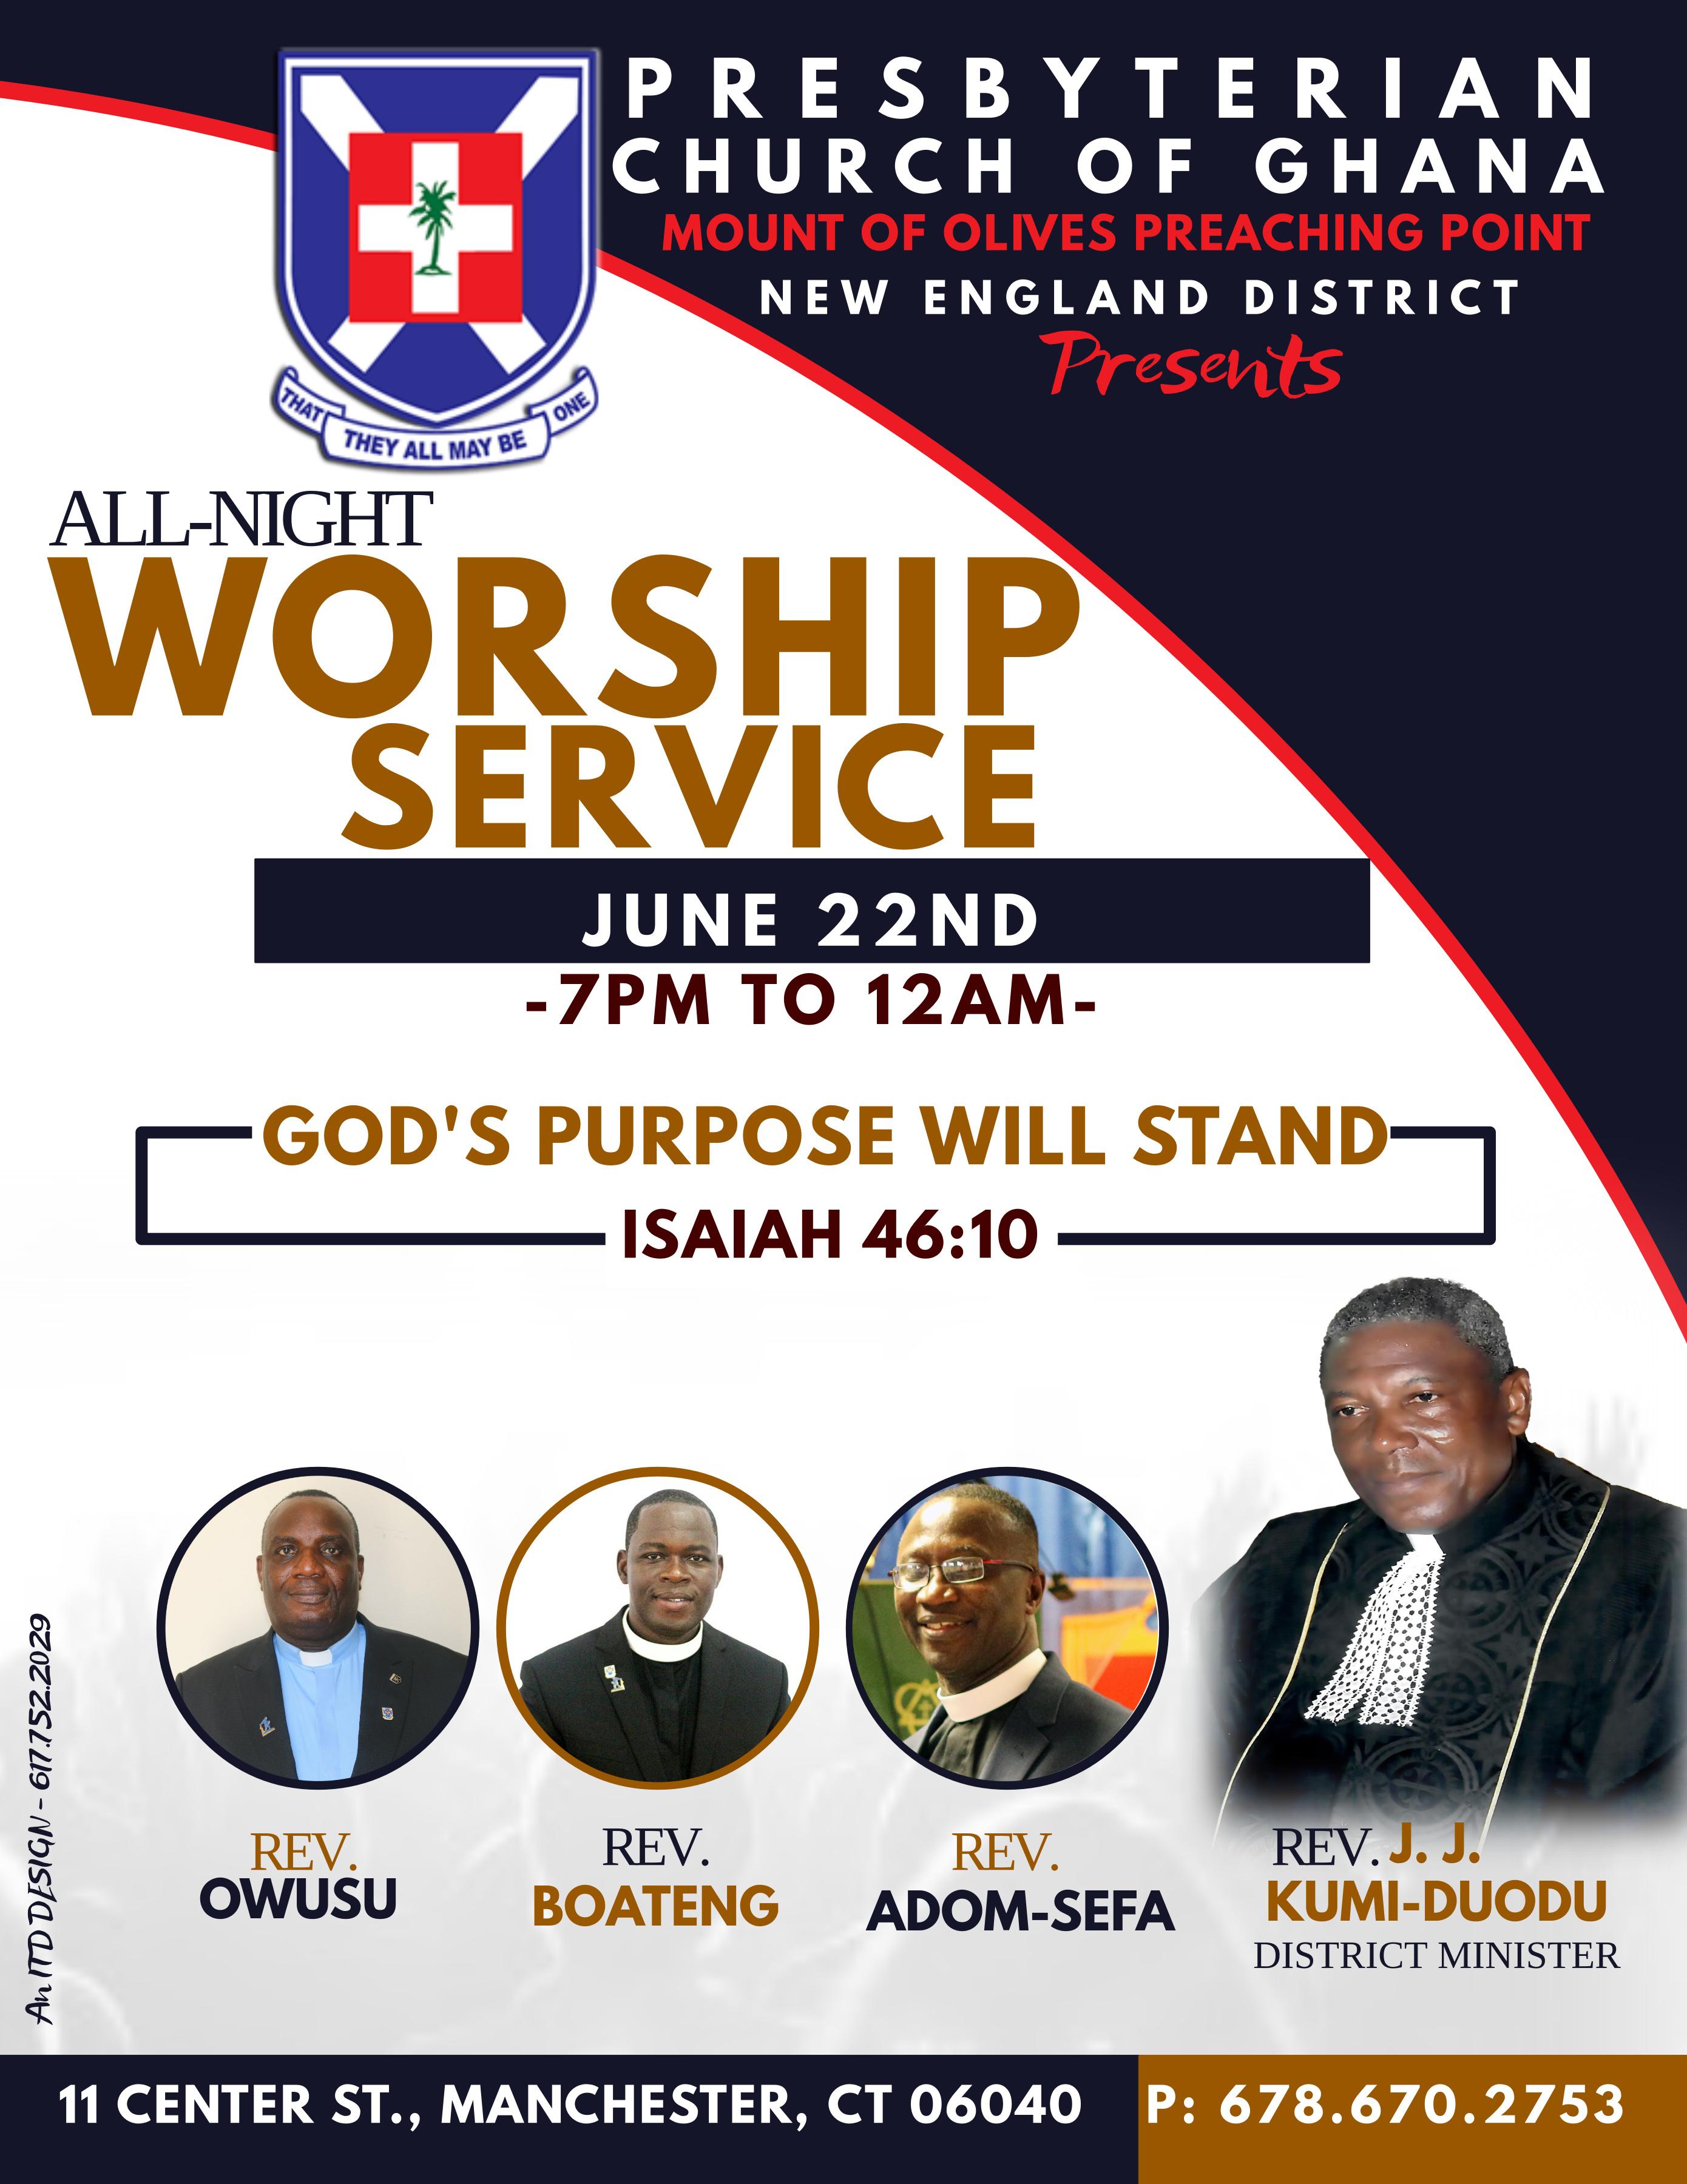 ALL-NIGHT WORSHIP SERVICE